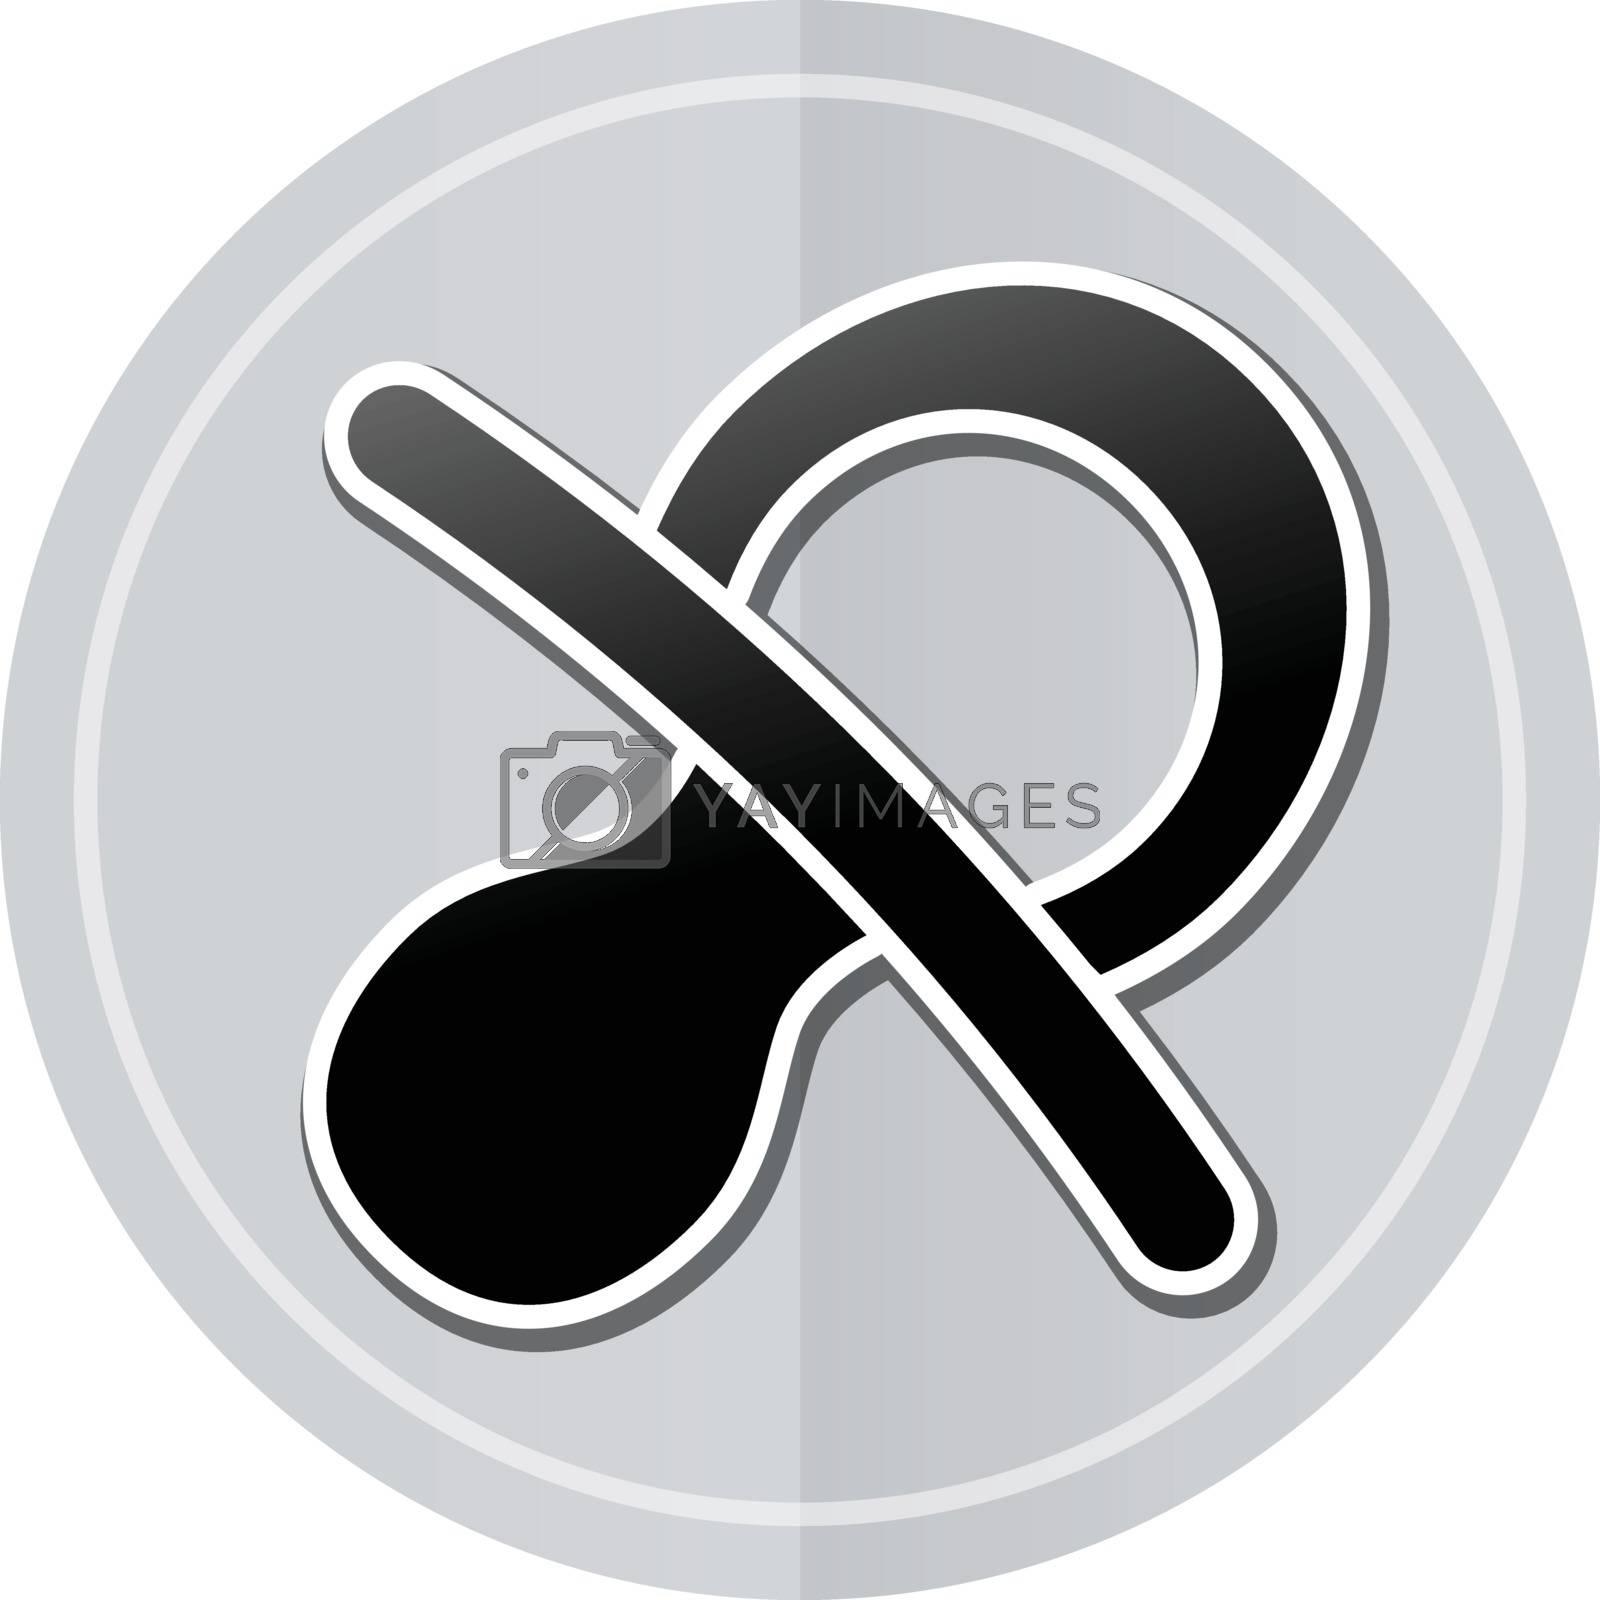 Illustration of baby sticker icon simple design